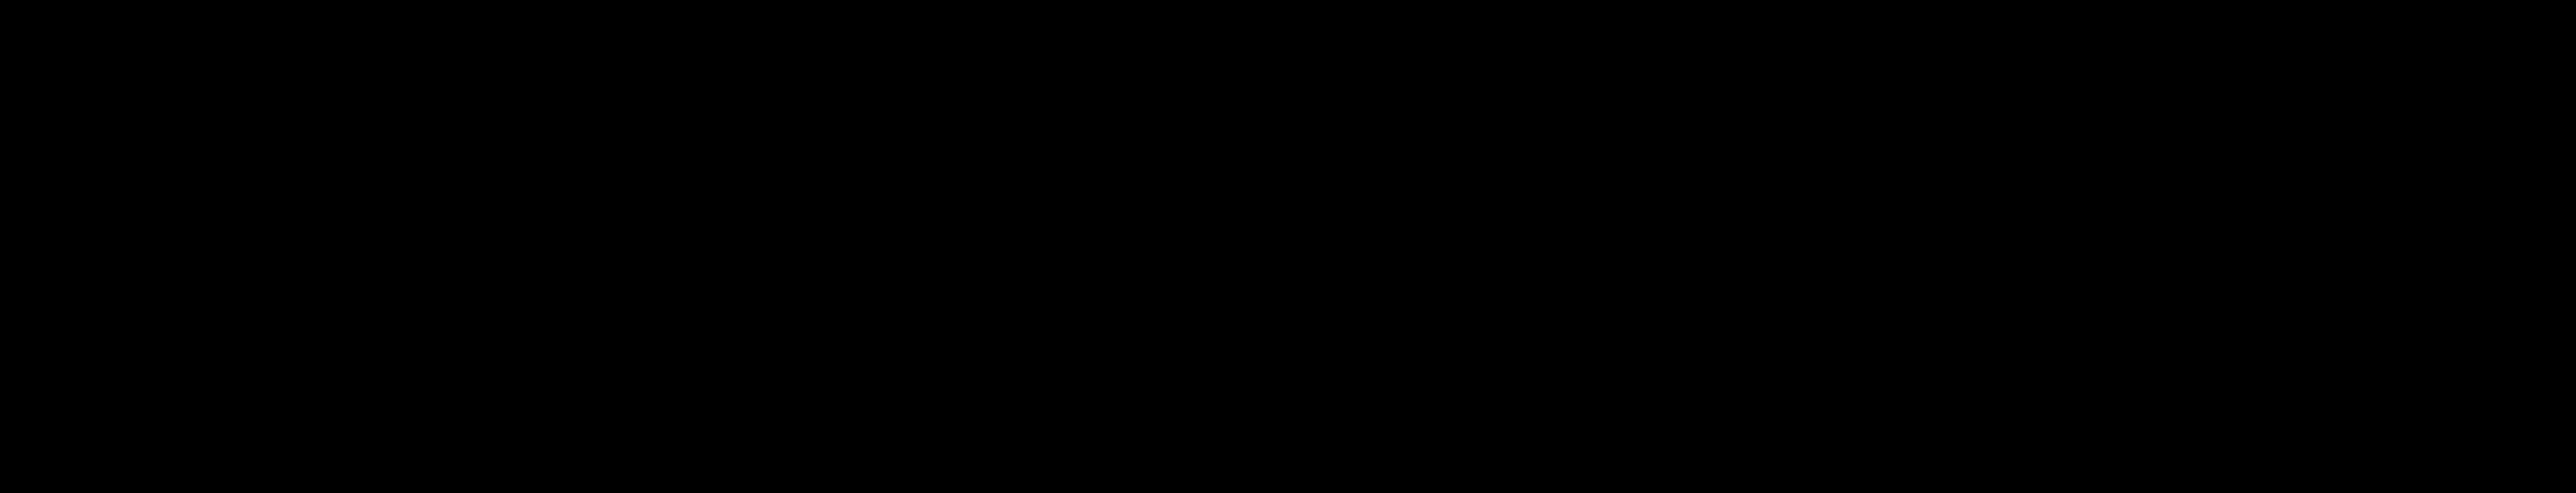 Schnittdesign Schule Hamburg Retina Logo